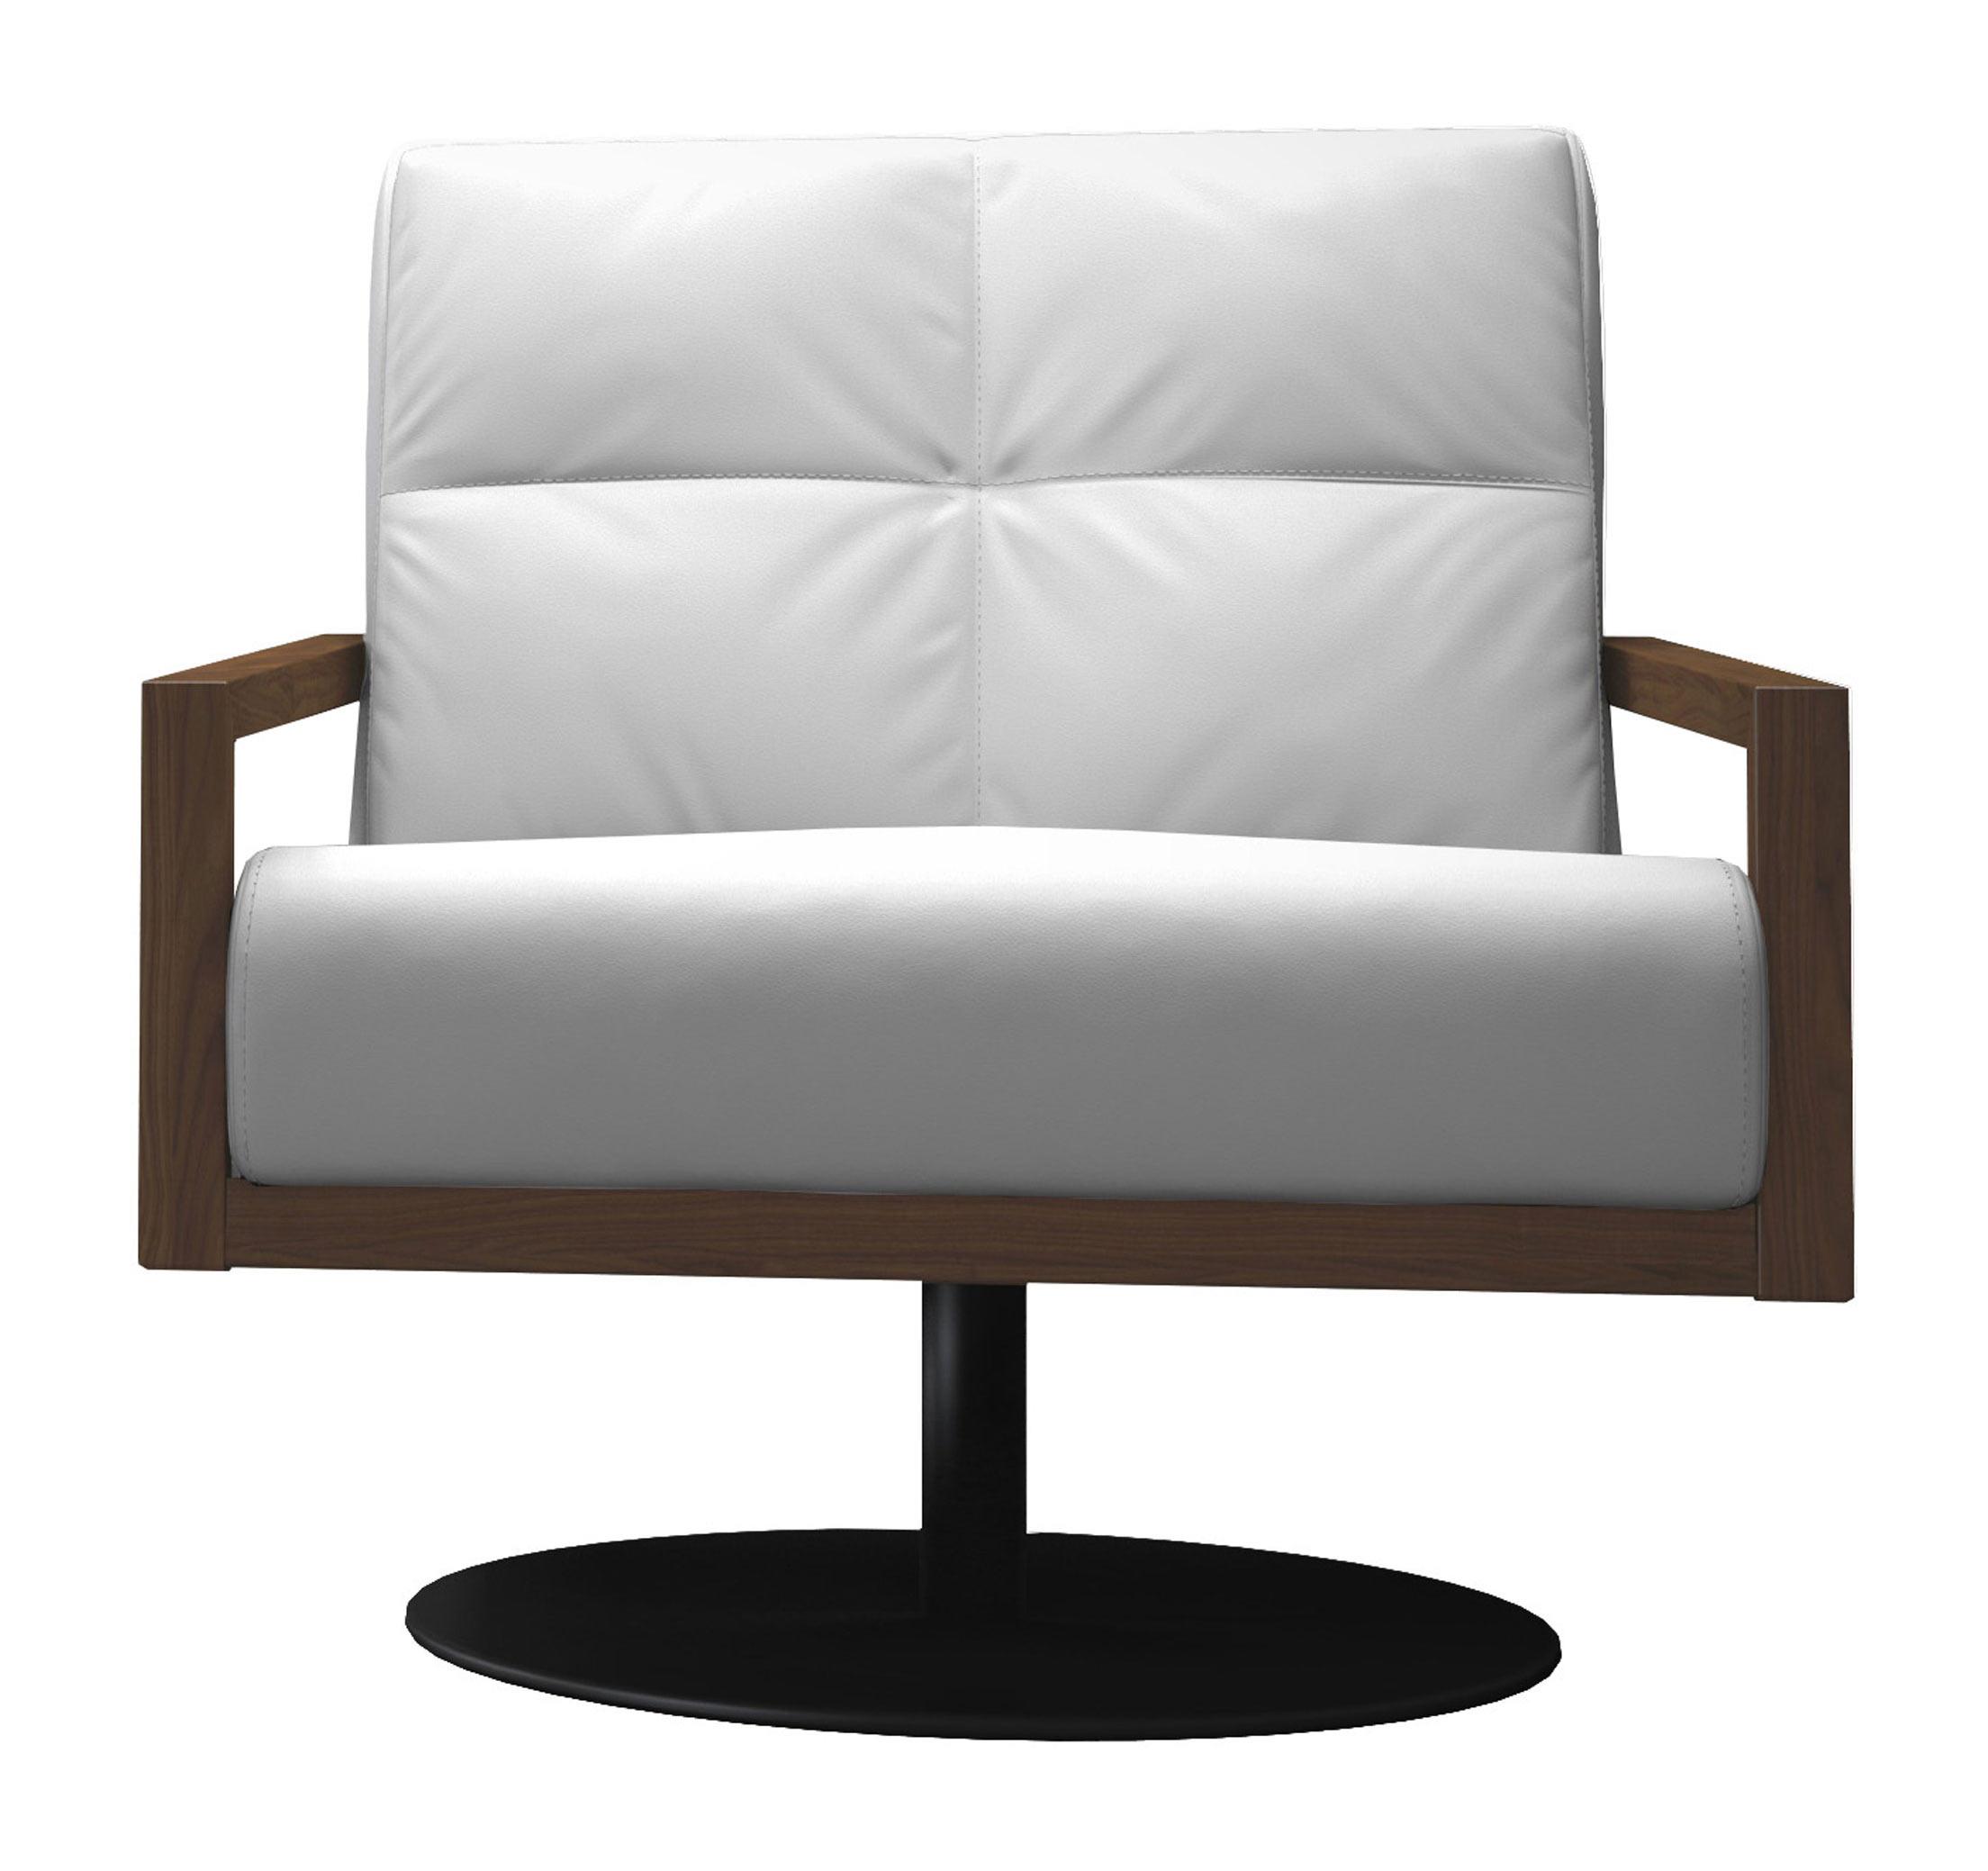 Clarkson Lounge Chair Soft Snow and Walnut by Modloft